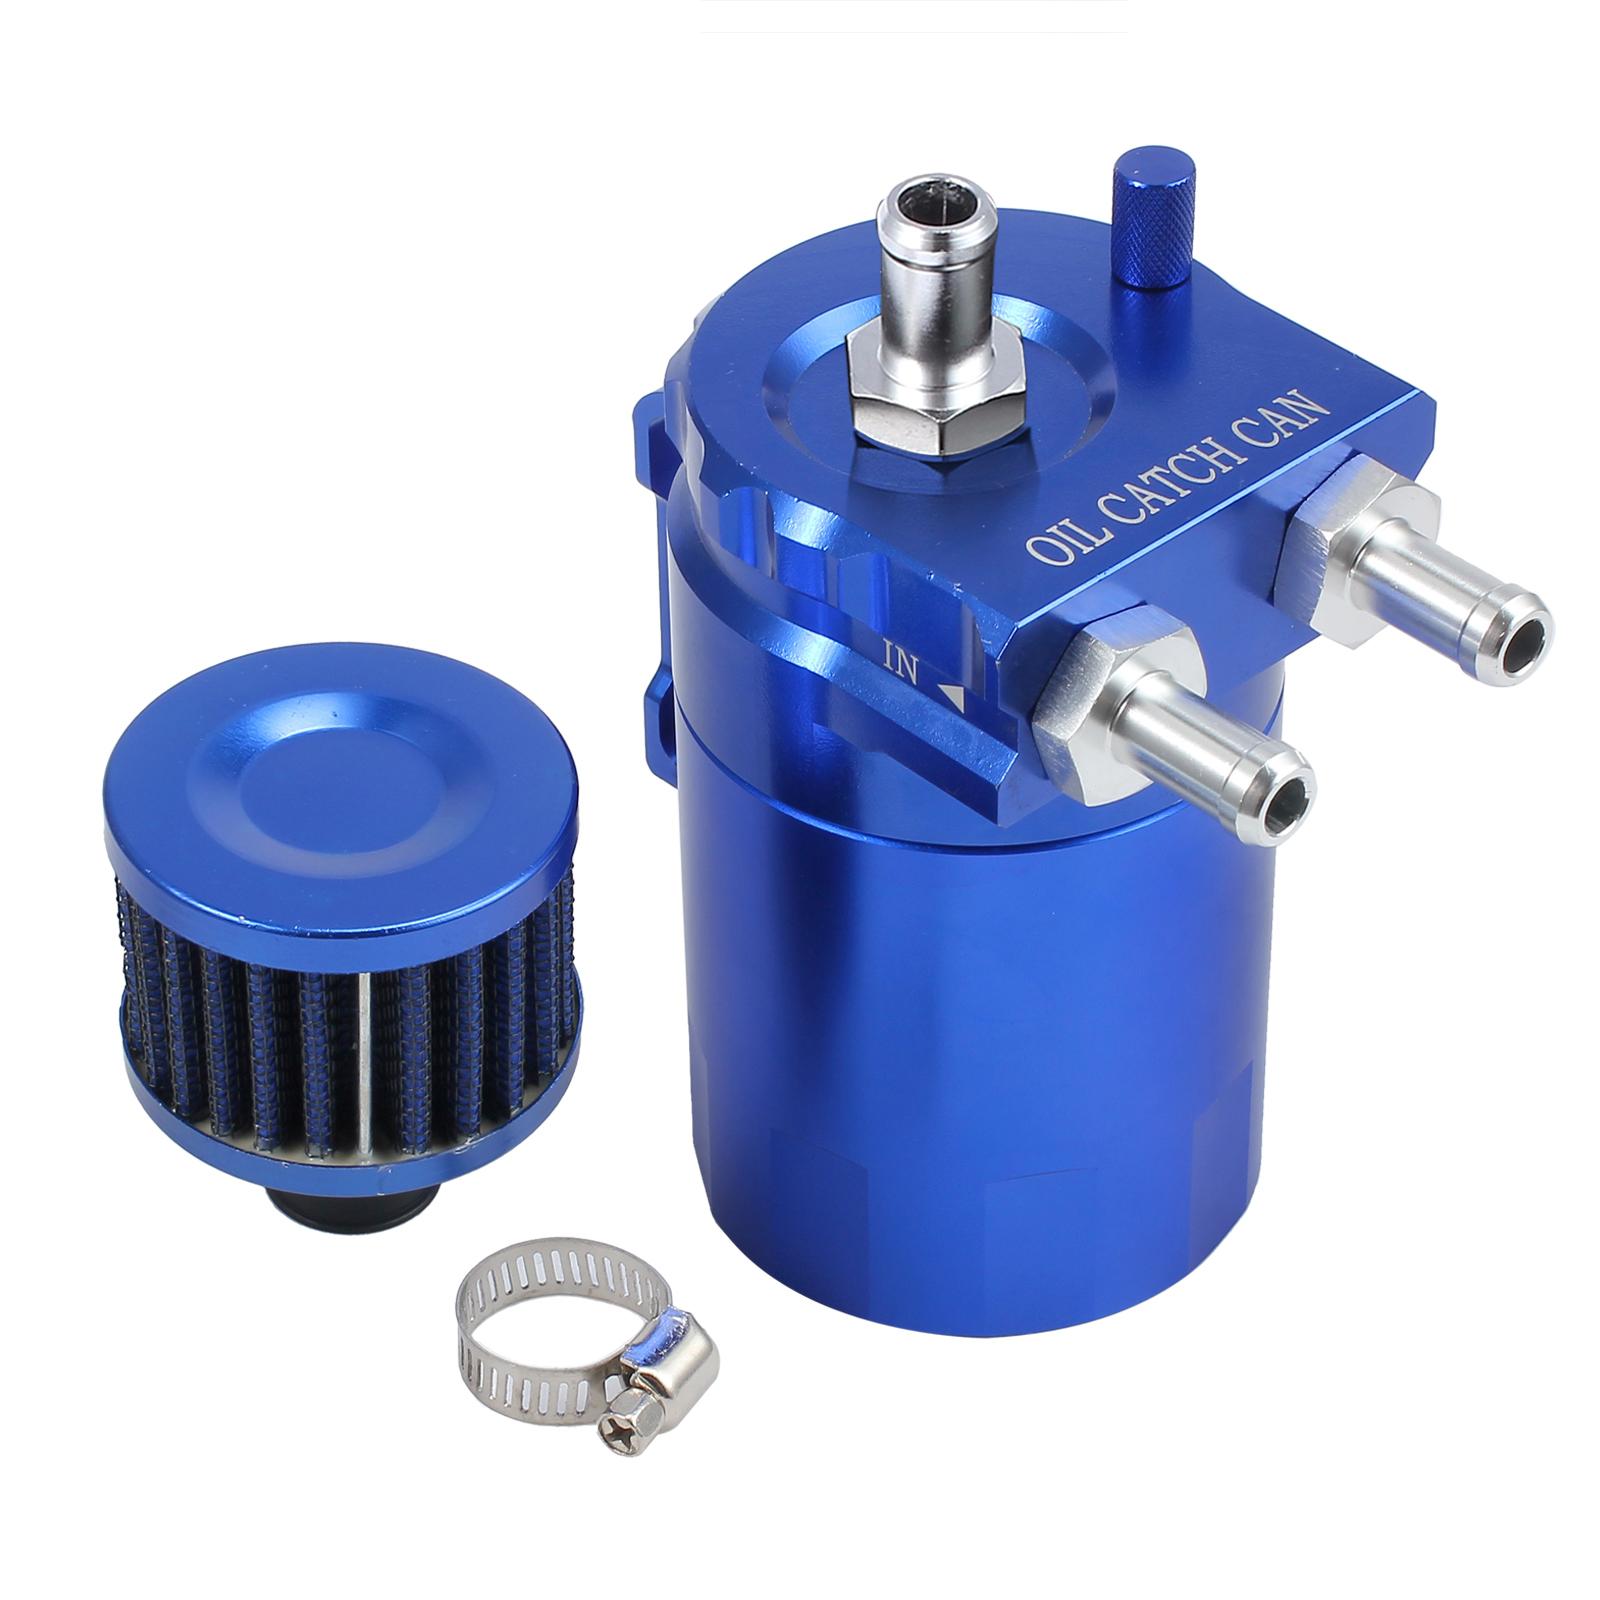 blue aluminum engine oil catch tank cylinder catch. Black Bedroom Furniture Sets. Home Design Ideas